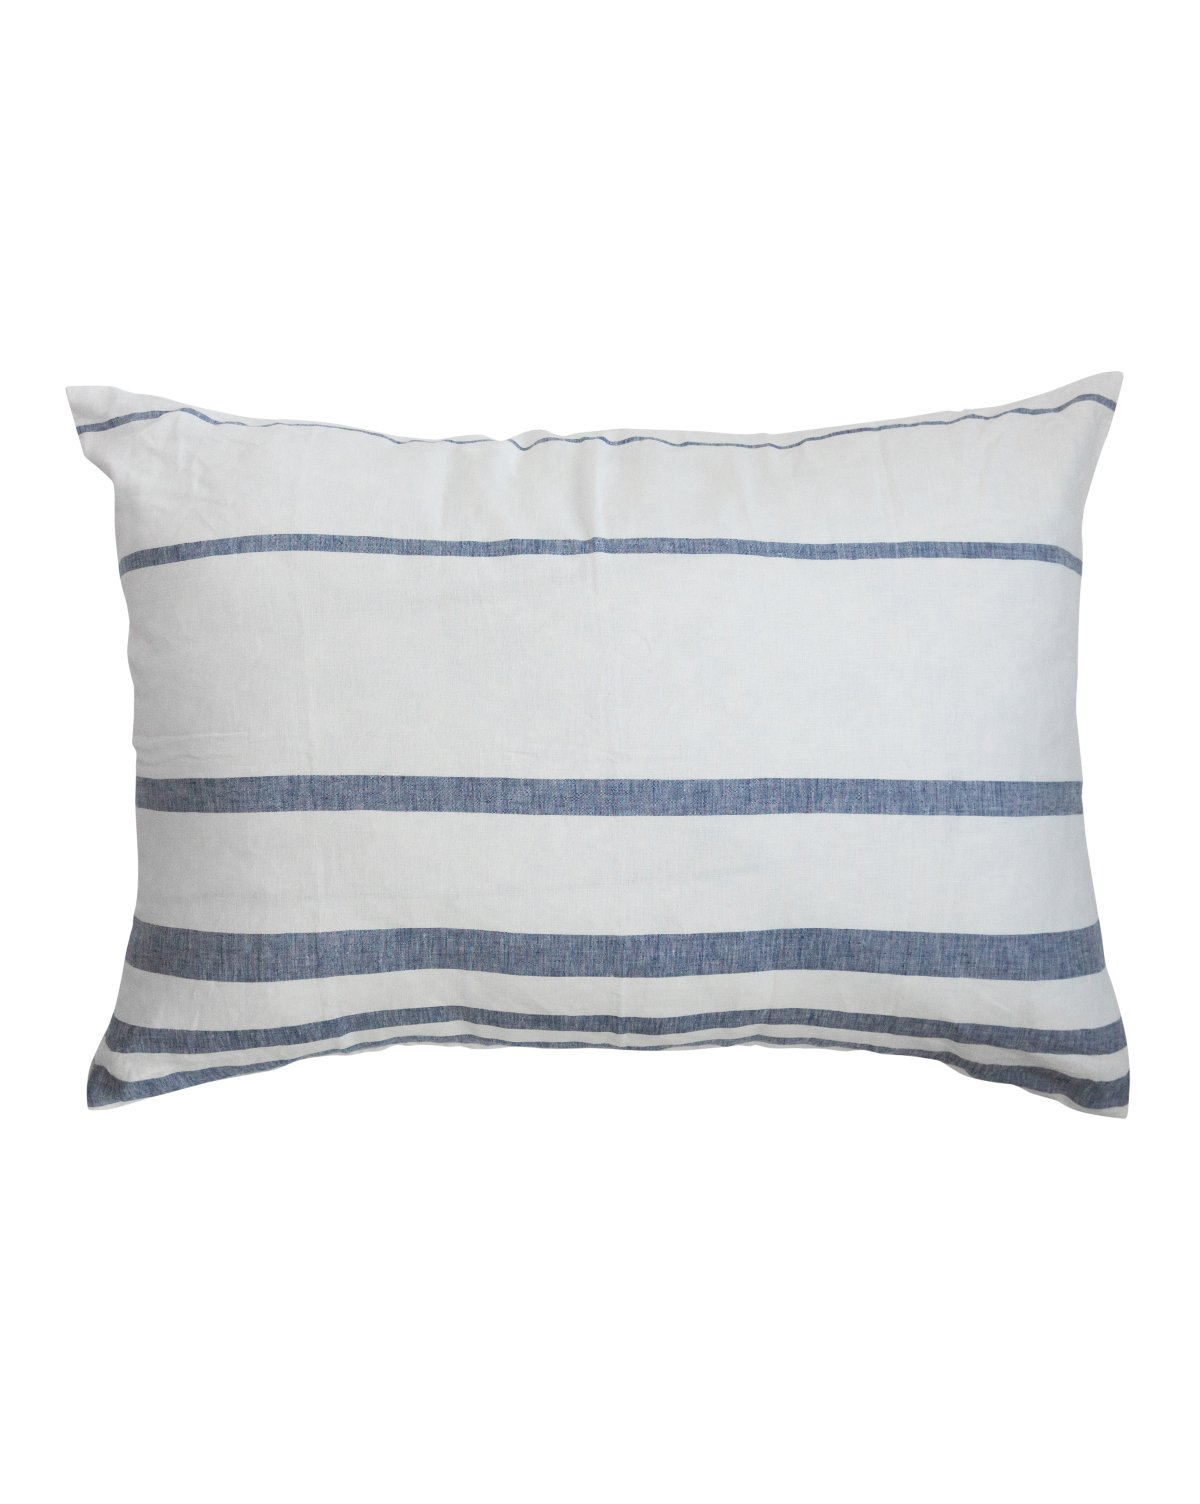 Oreta_Headboard_Cushion_Blue_No_2-1.jpg